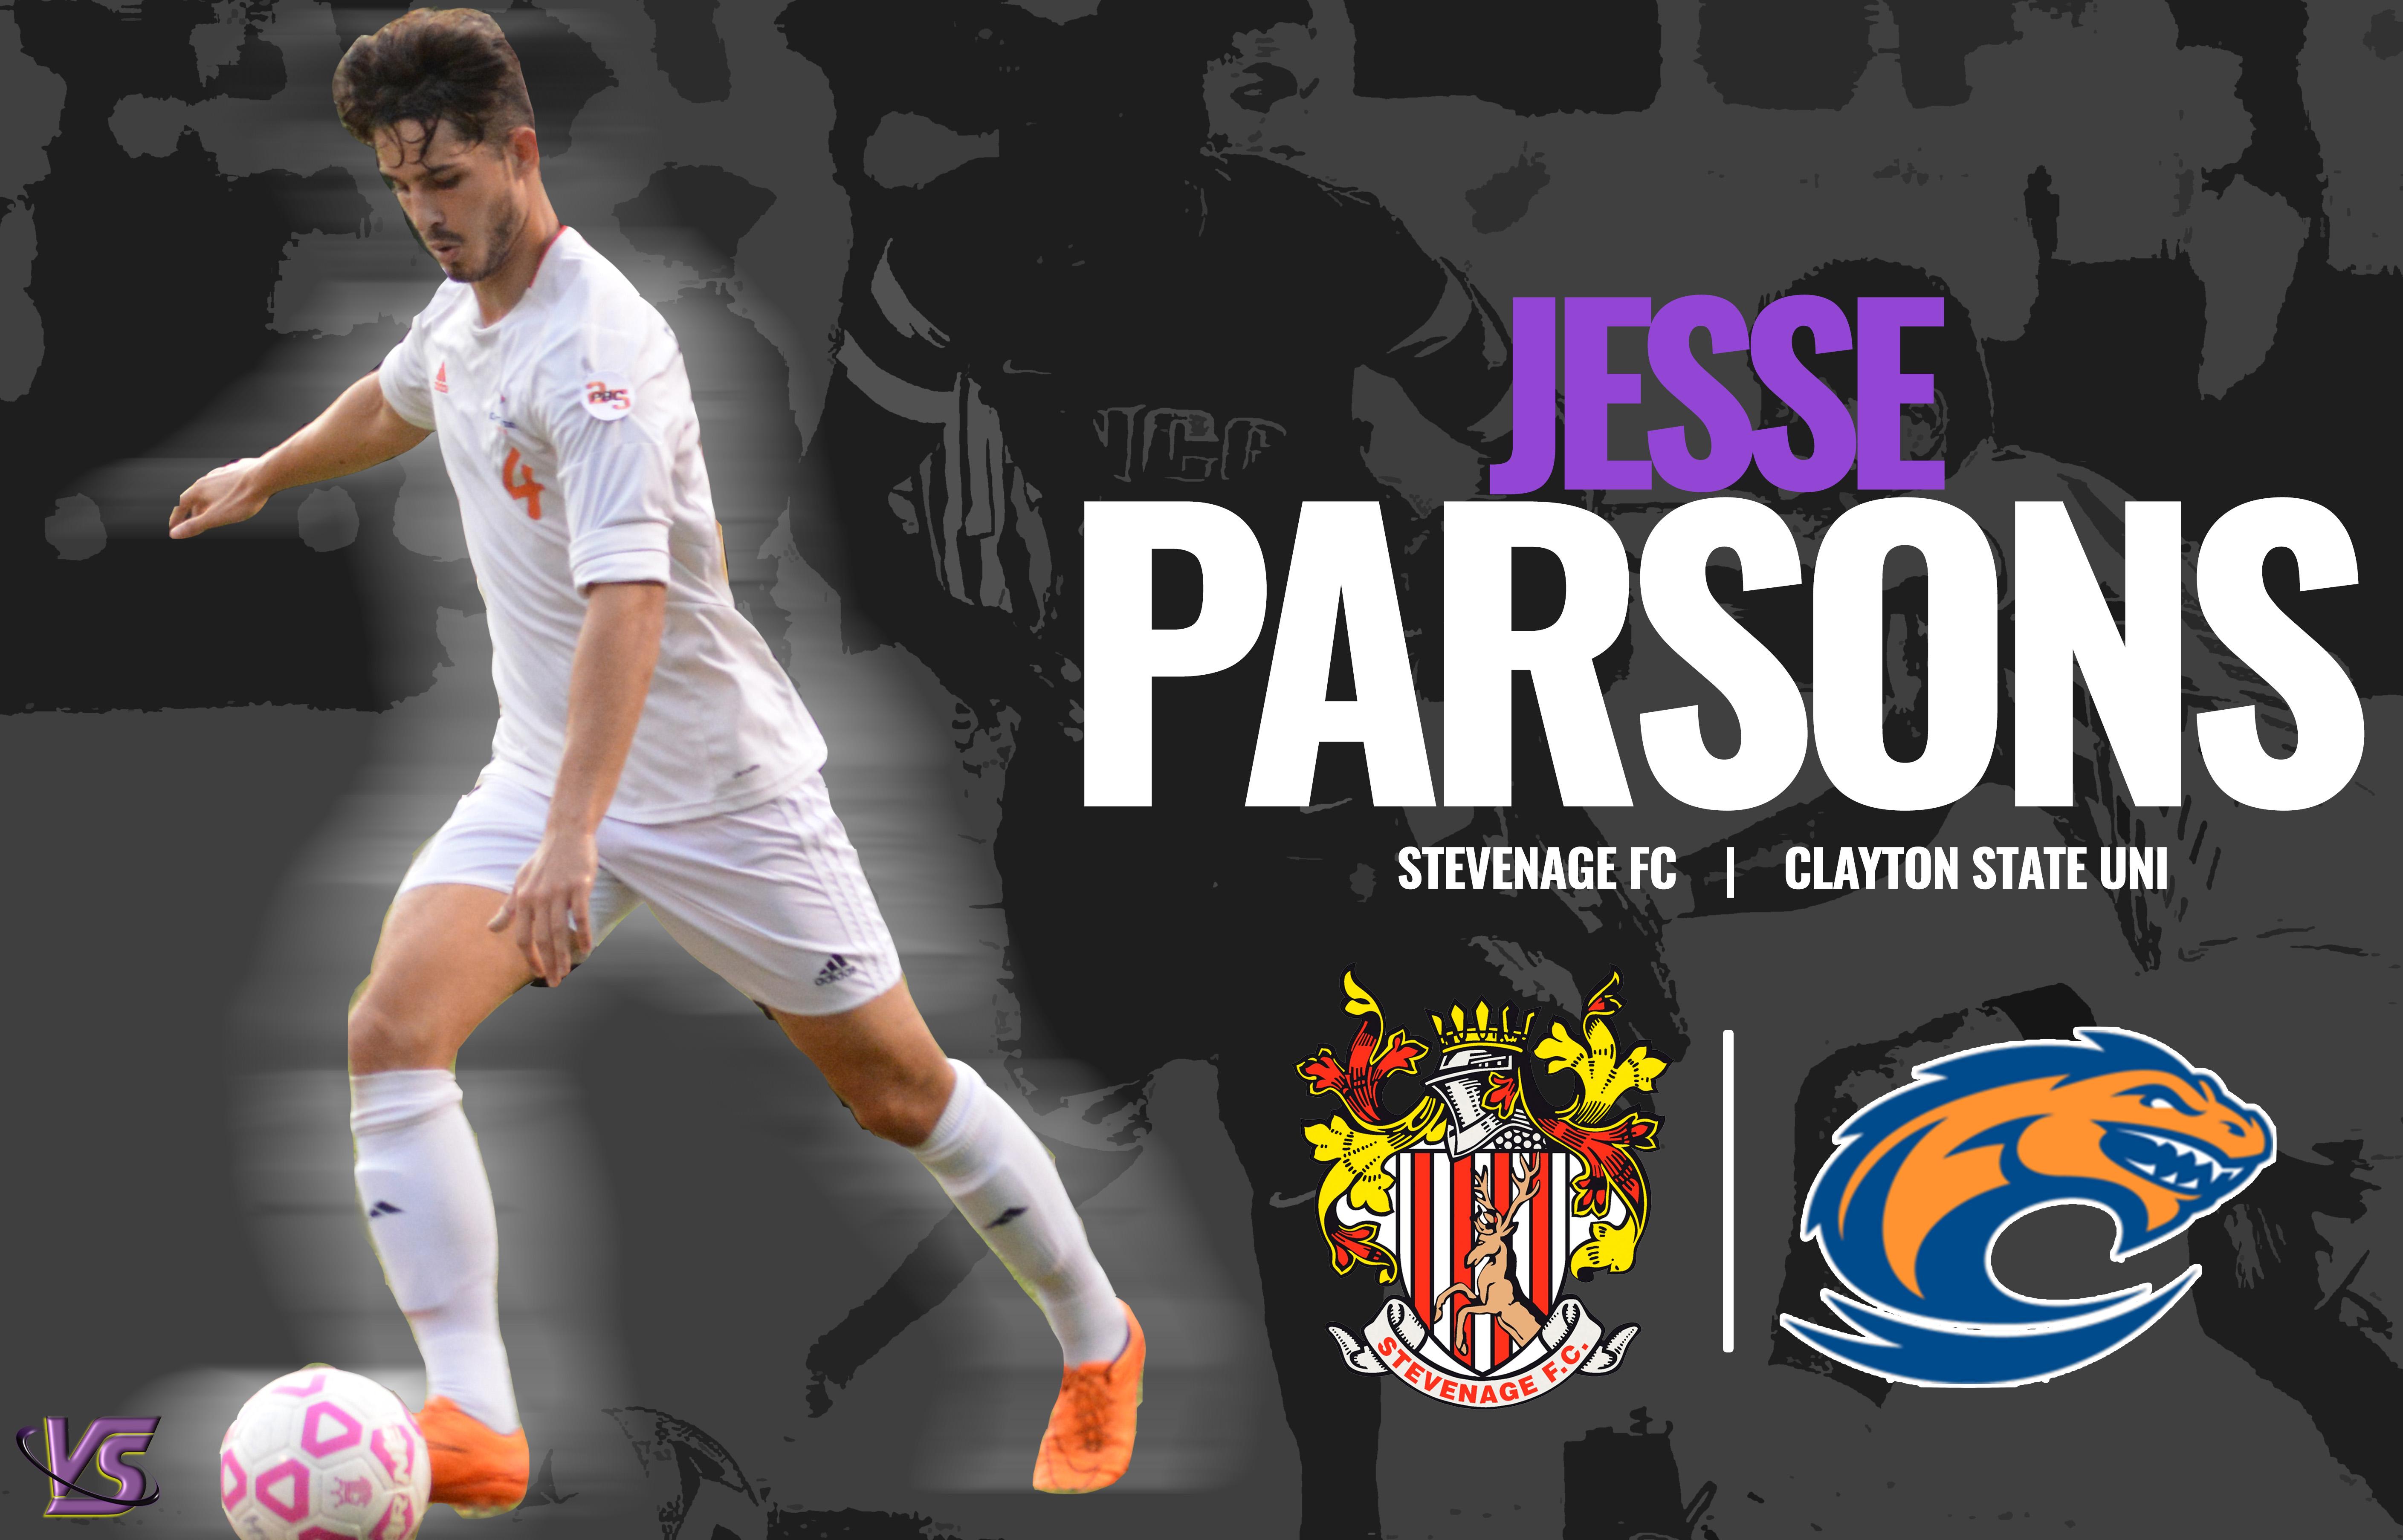 Jesse Parsons 2014